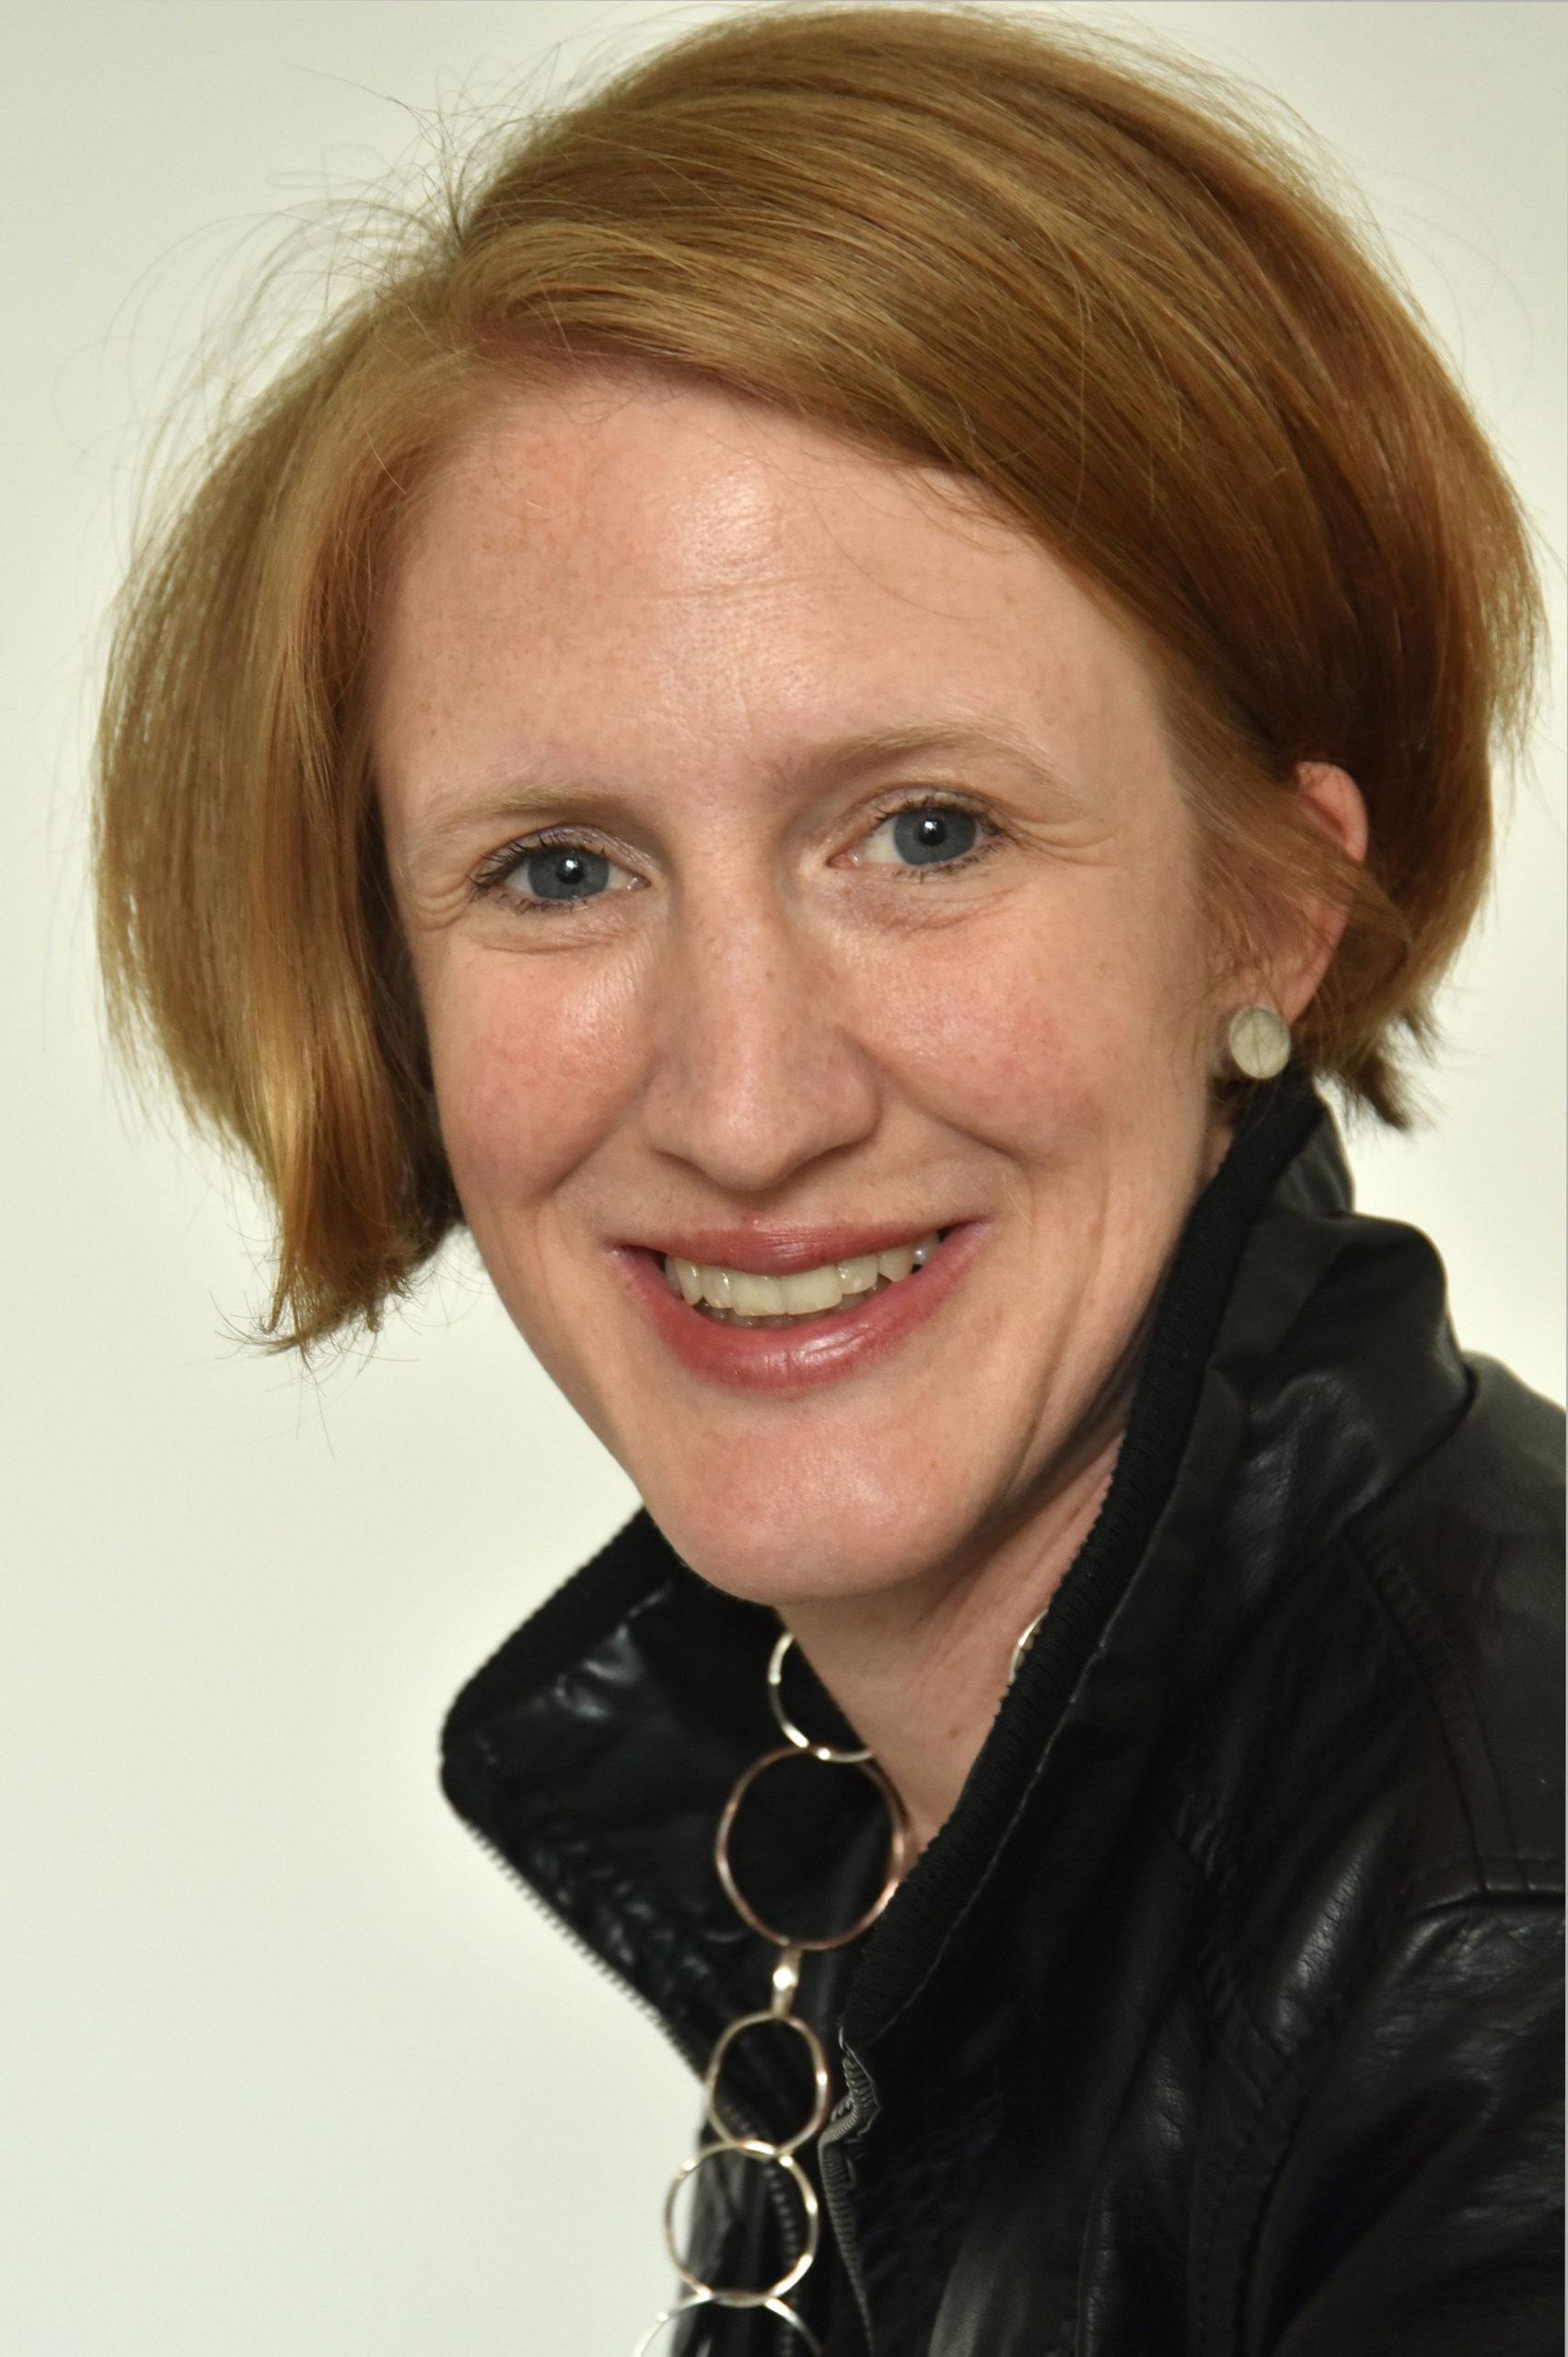 Silke Van Dyk